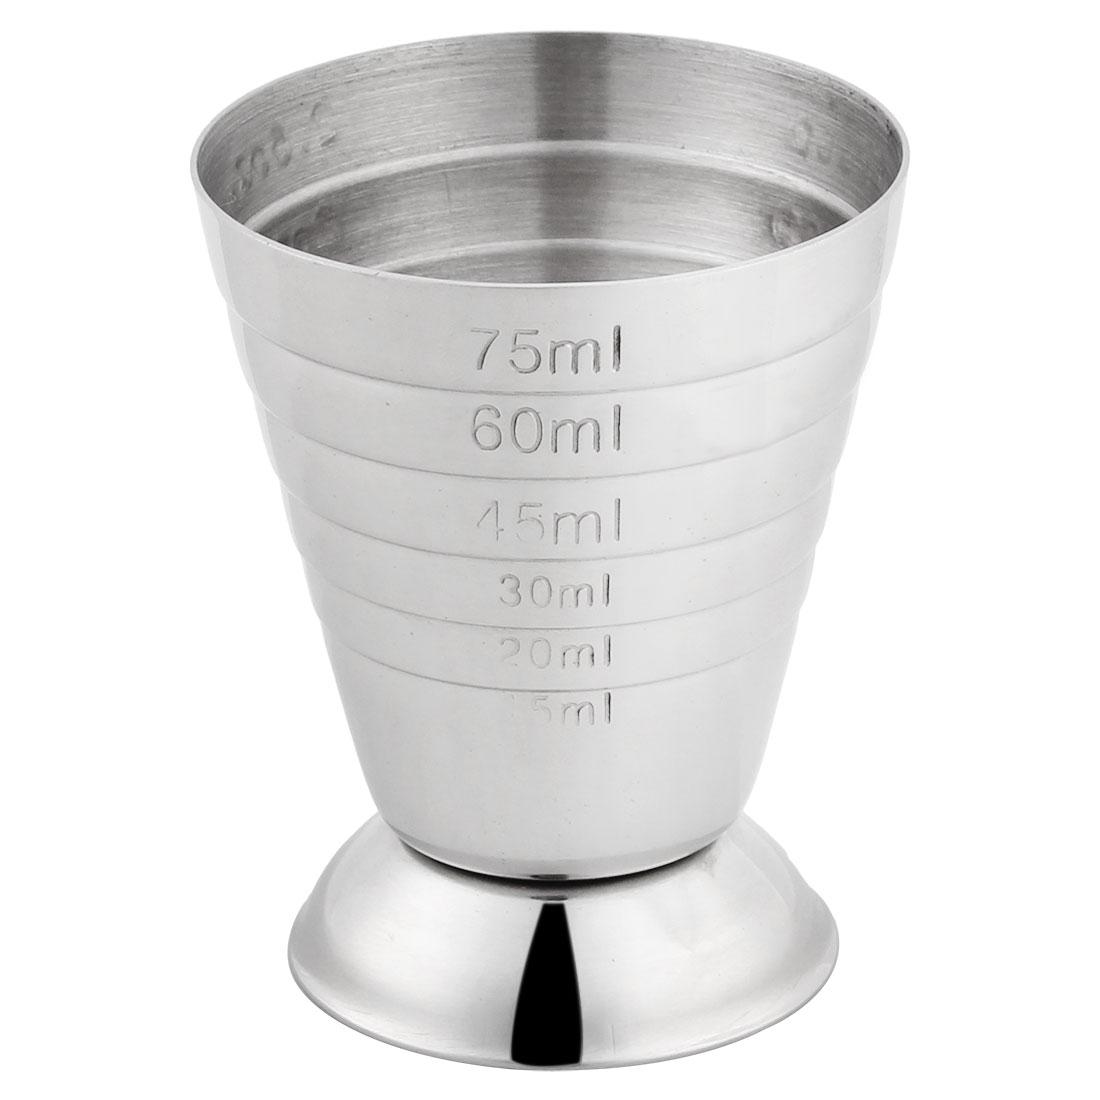 Kitchen Baking Stainless Steel Beaker Water Liquid Measuring Cup Holder 75ml